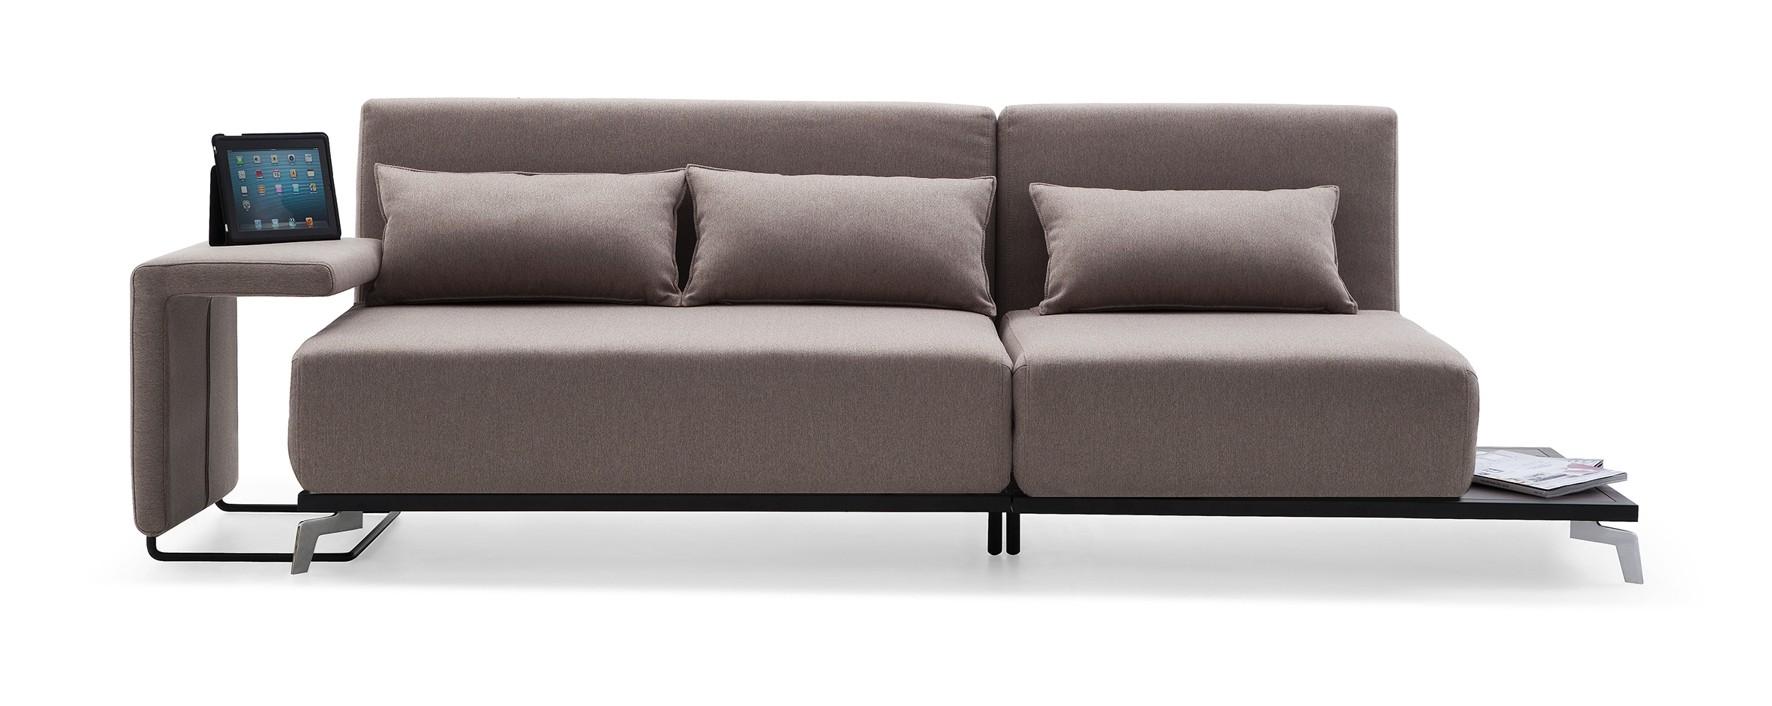 cado modern furniture - jh033 modern sofa bed ... CKVGCMP